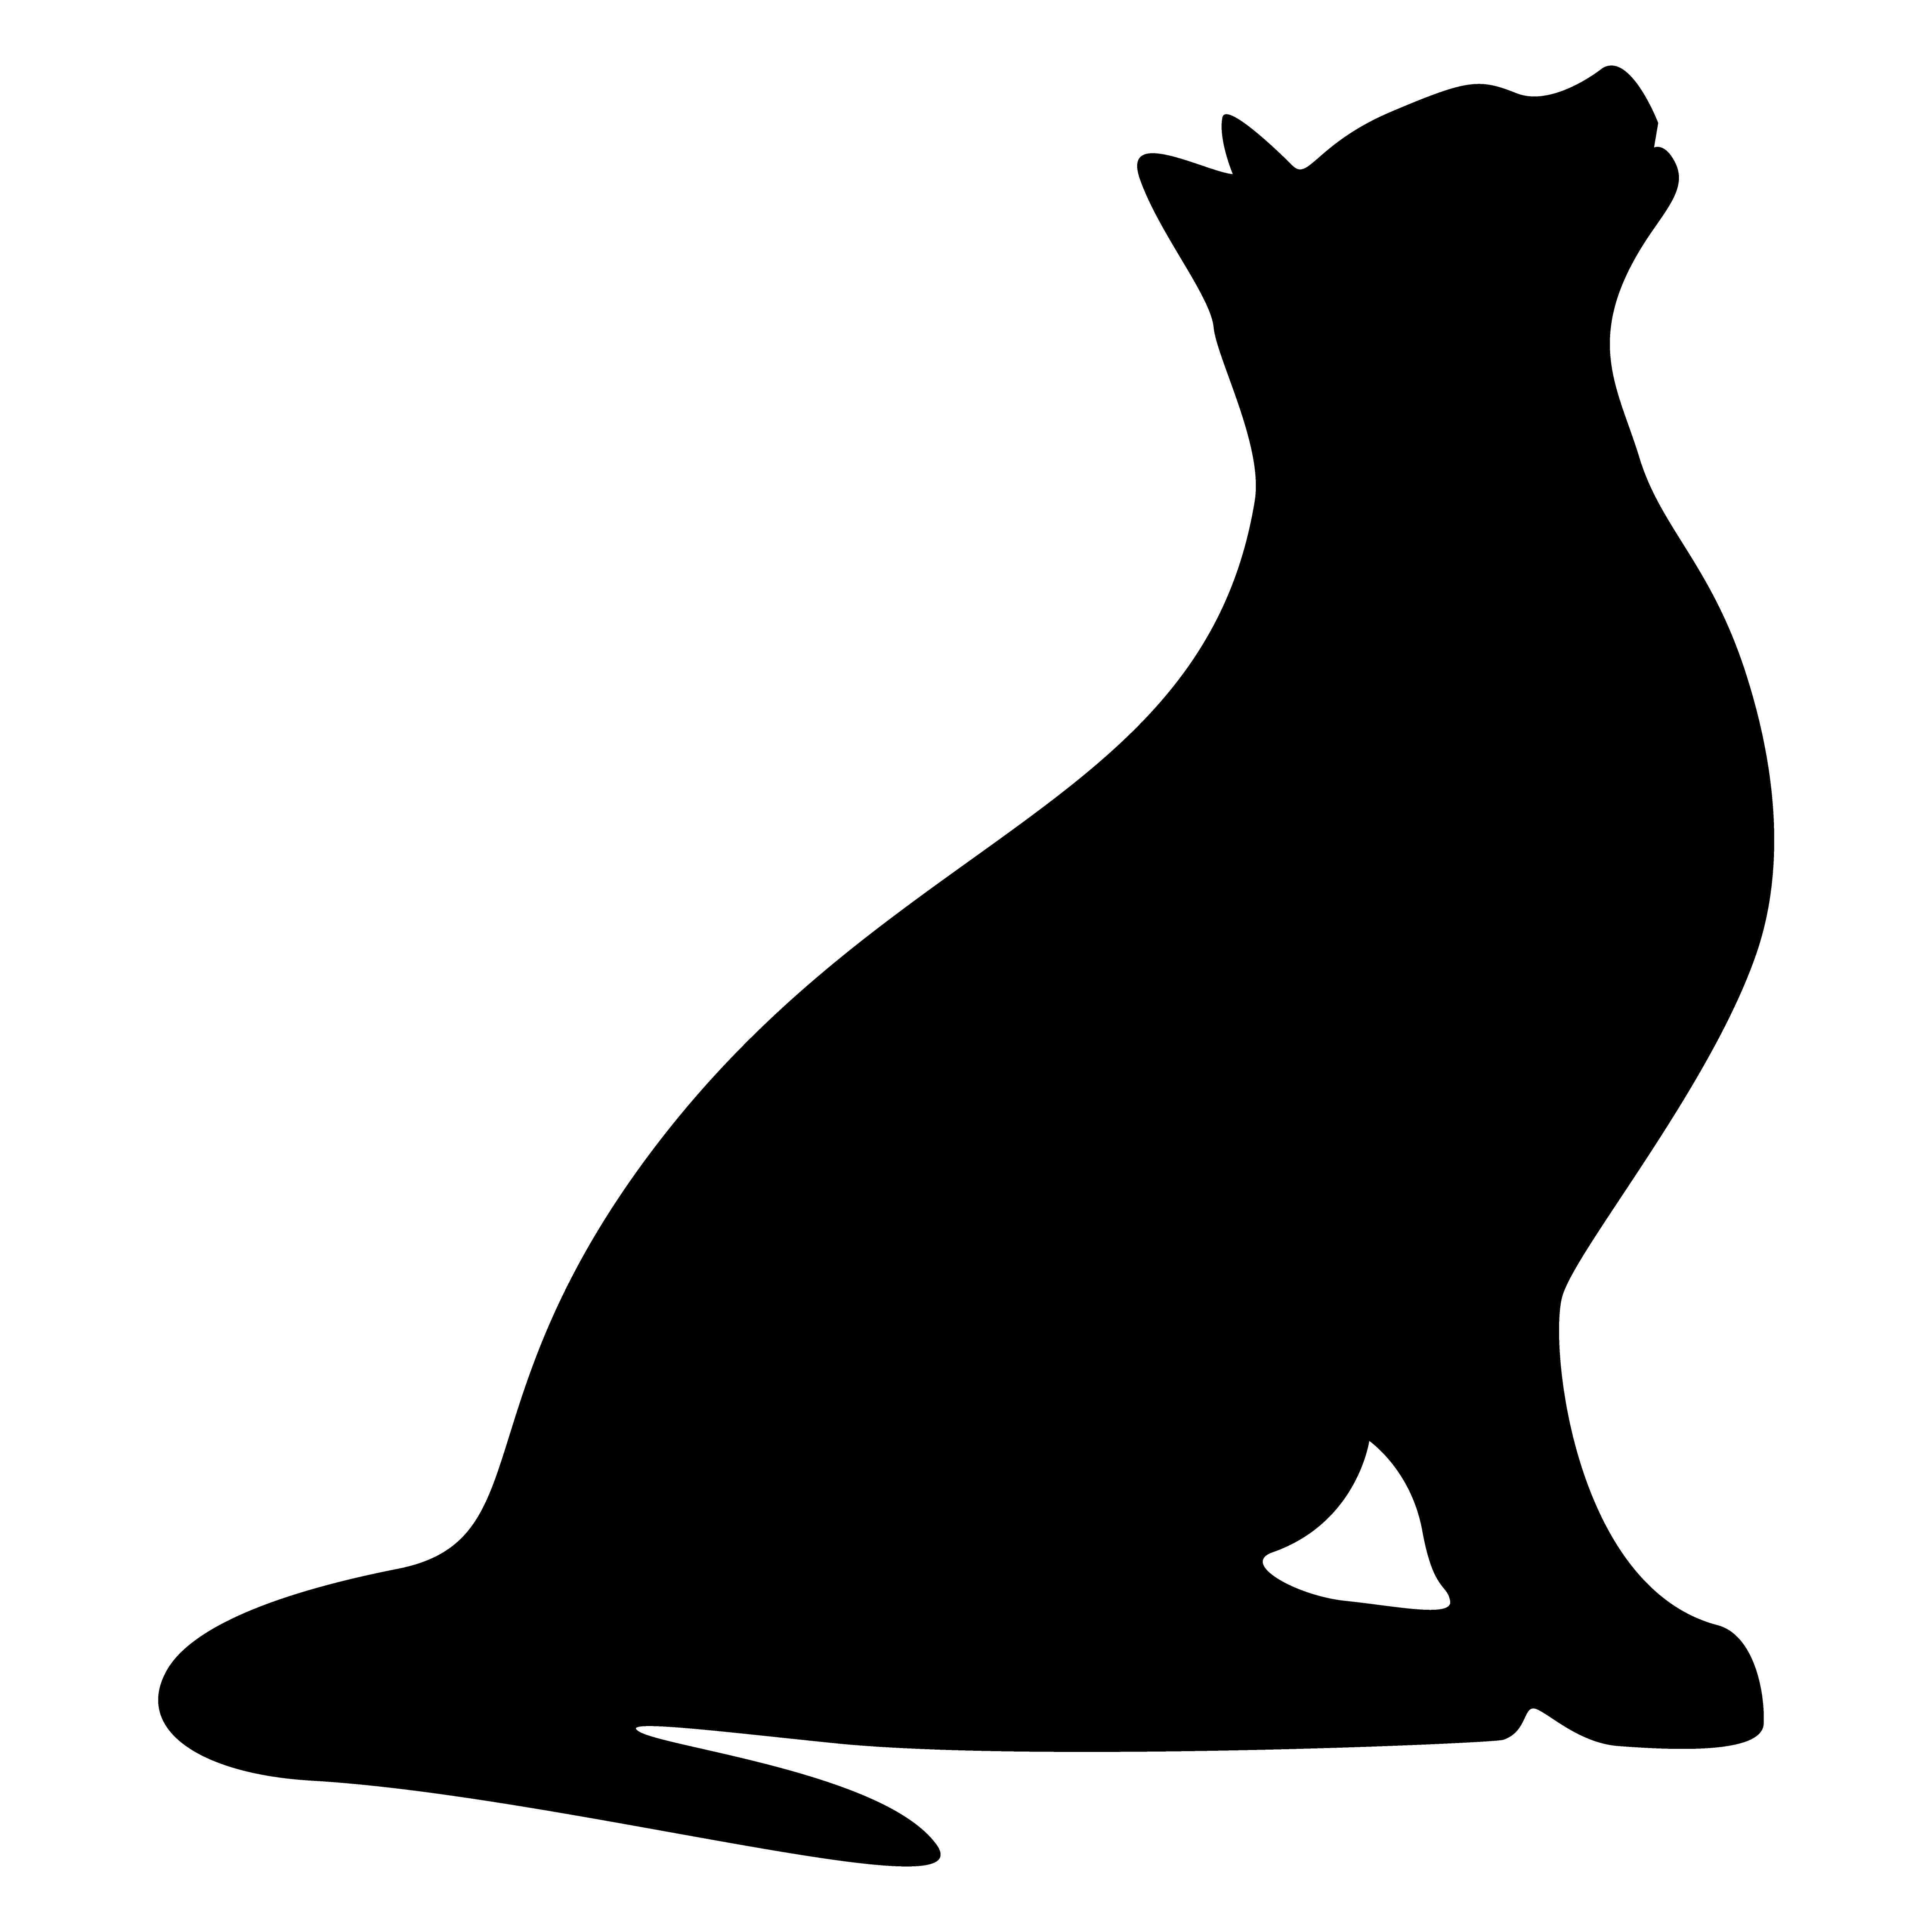 5000x5000 Cat Silhouette Vector Illustration